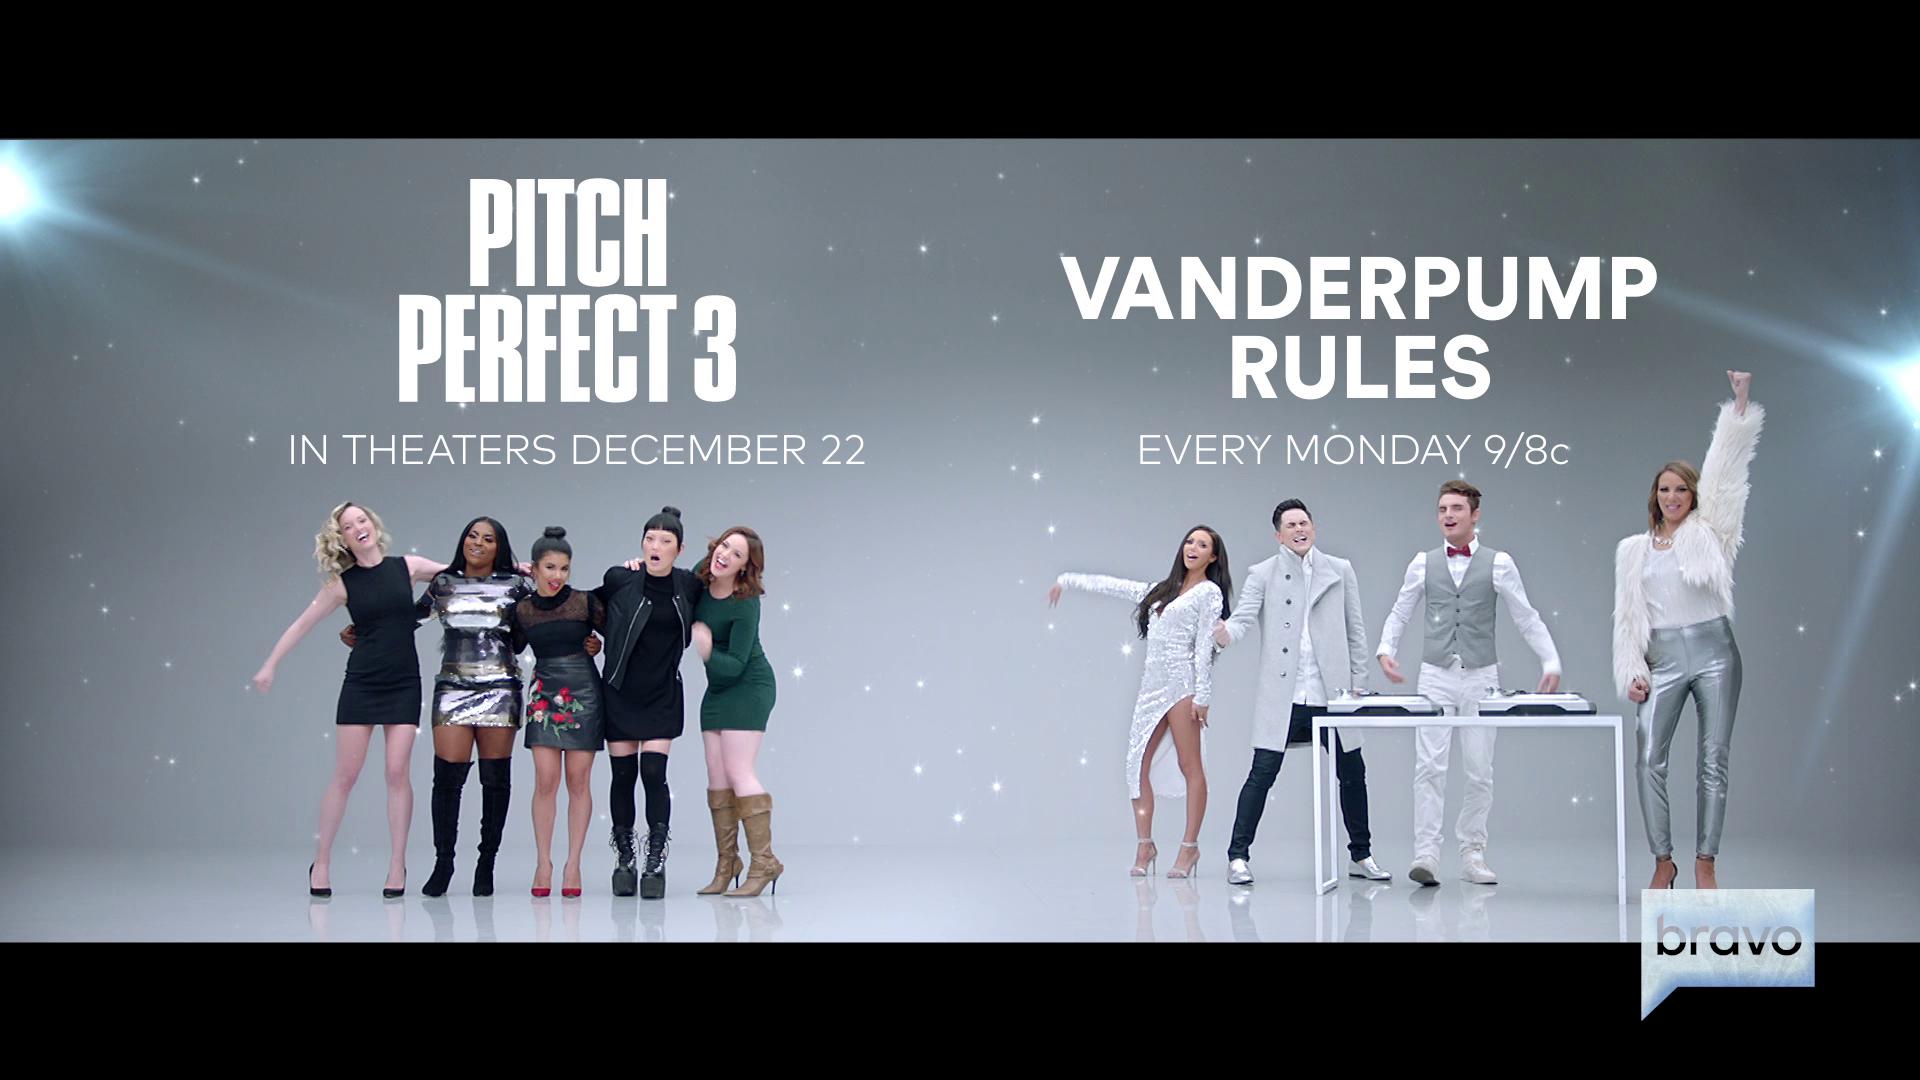 Bravo - Vanderpump Rules/Pitch Perfect 3